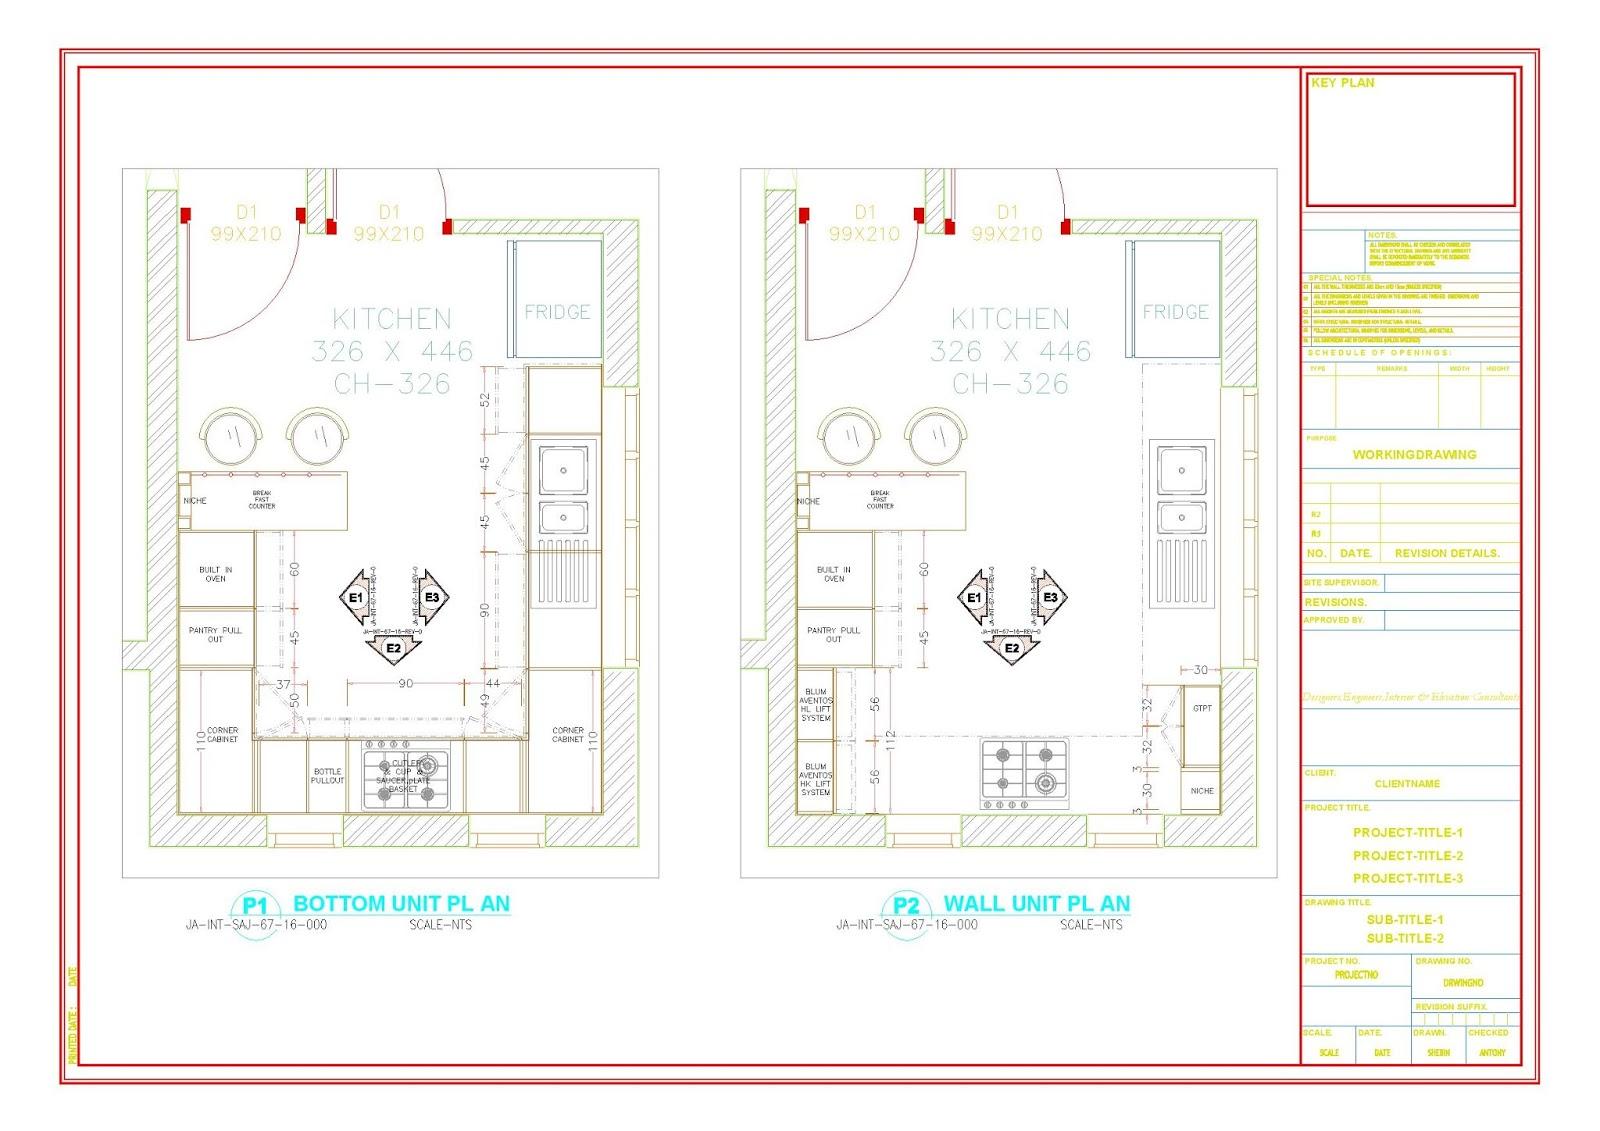 Home Architec Ideas Kitchen Interior Design Autocad Drawings